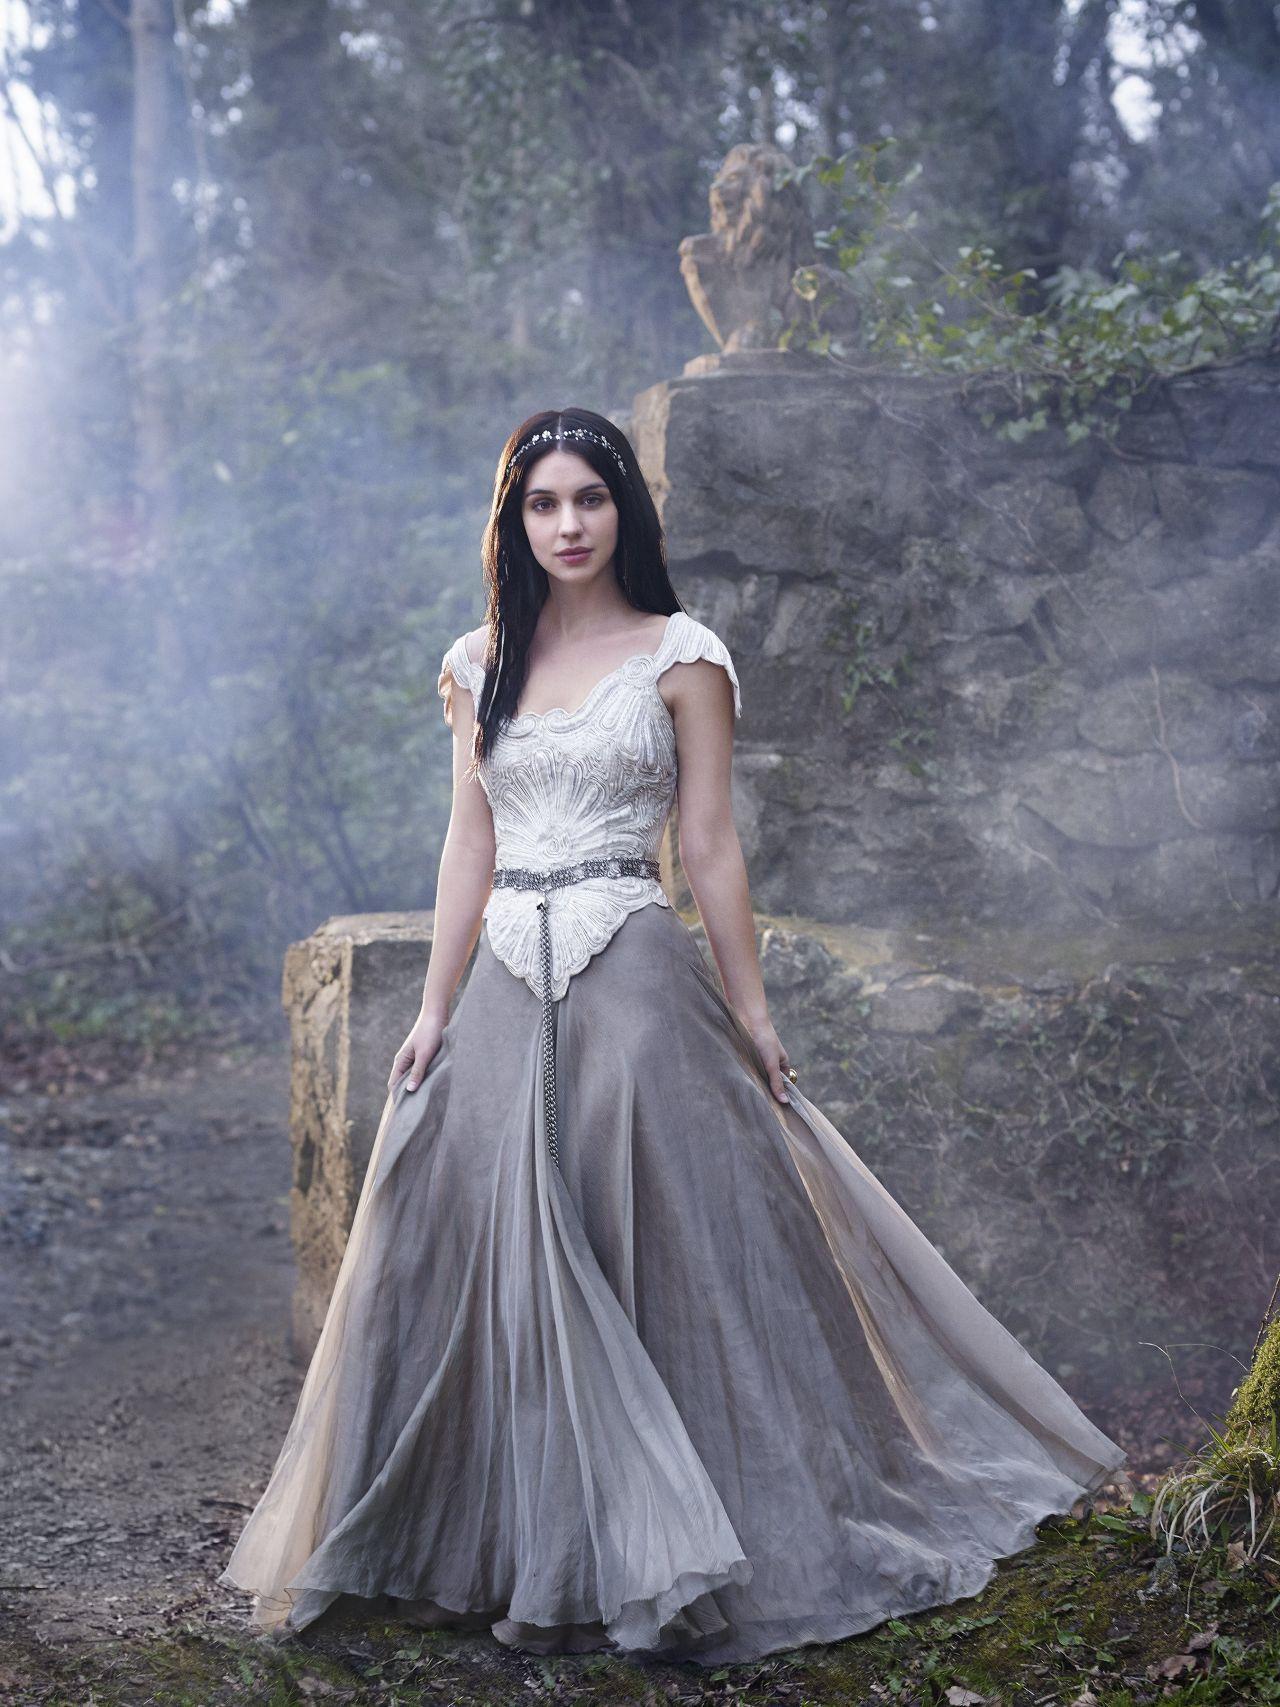 REIGN TV Series Promoshoot - Adelaide Kane